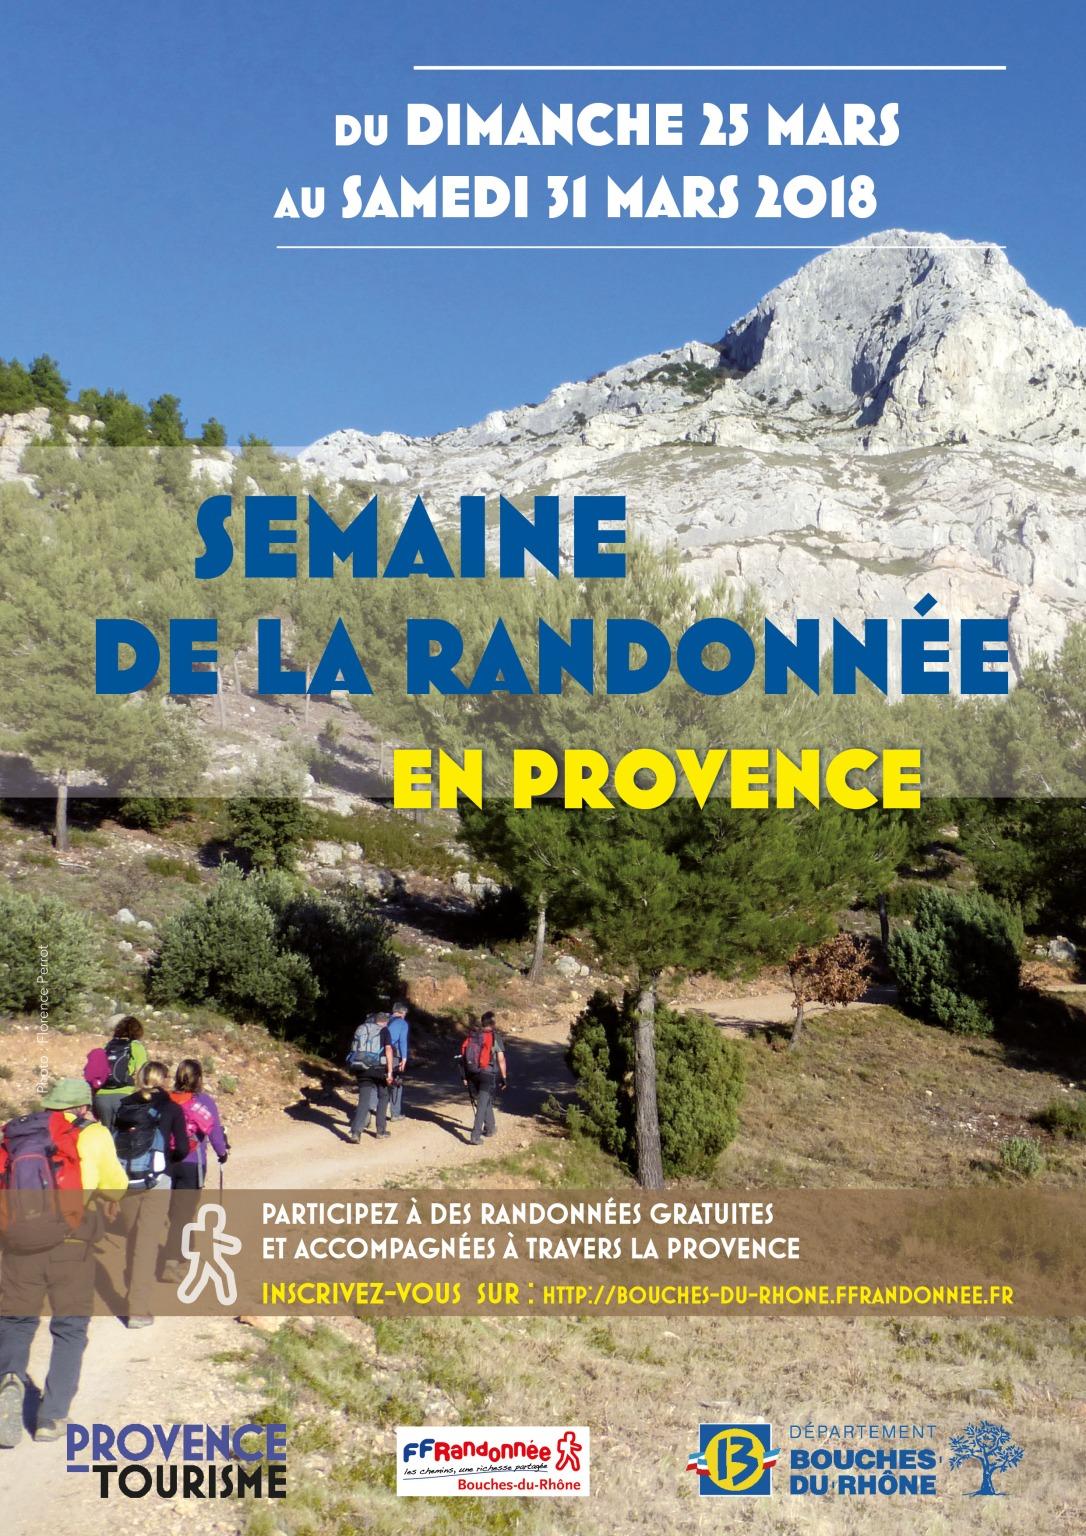 Semaine de la Randonnée en Provence.jpg